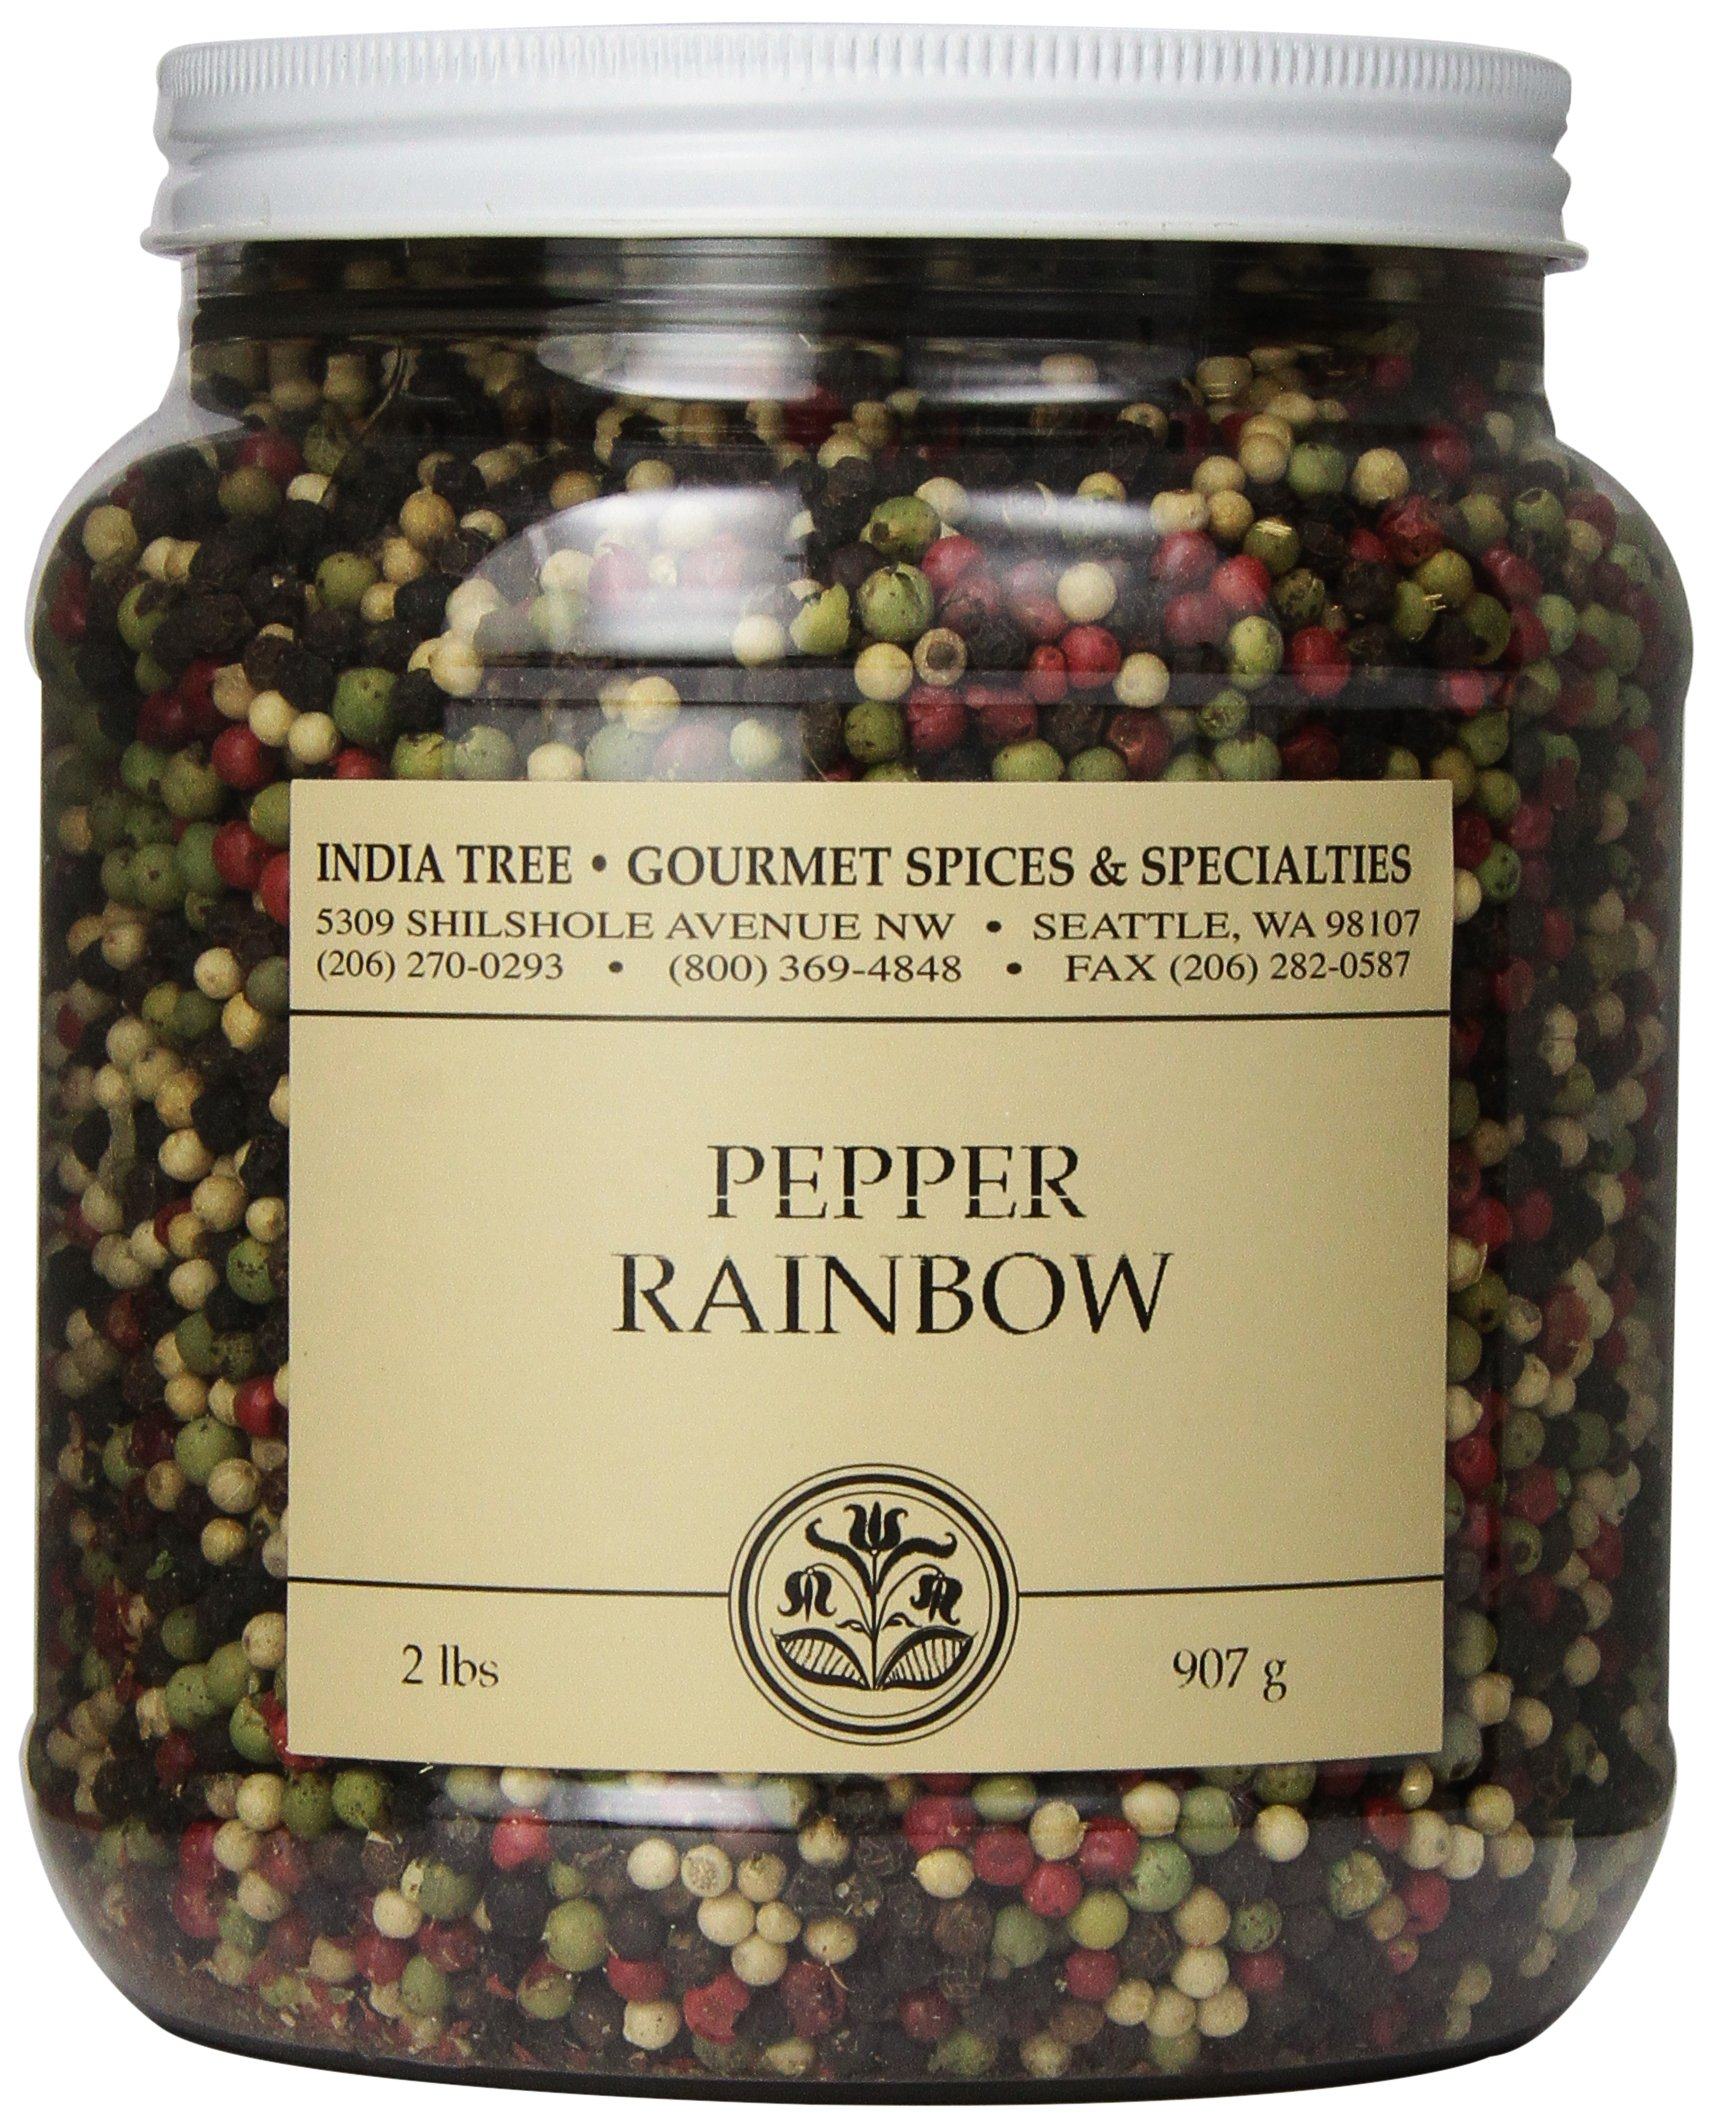 India Tree Pepper Rainbow, 2 lb